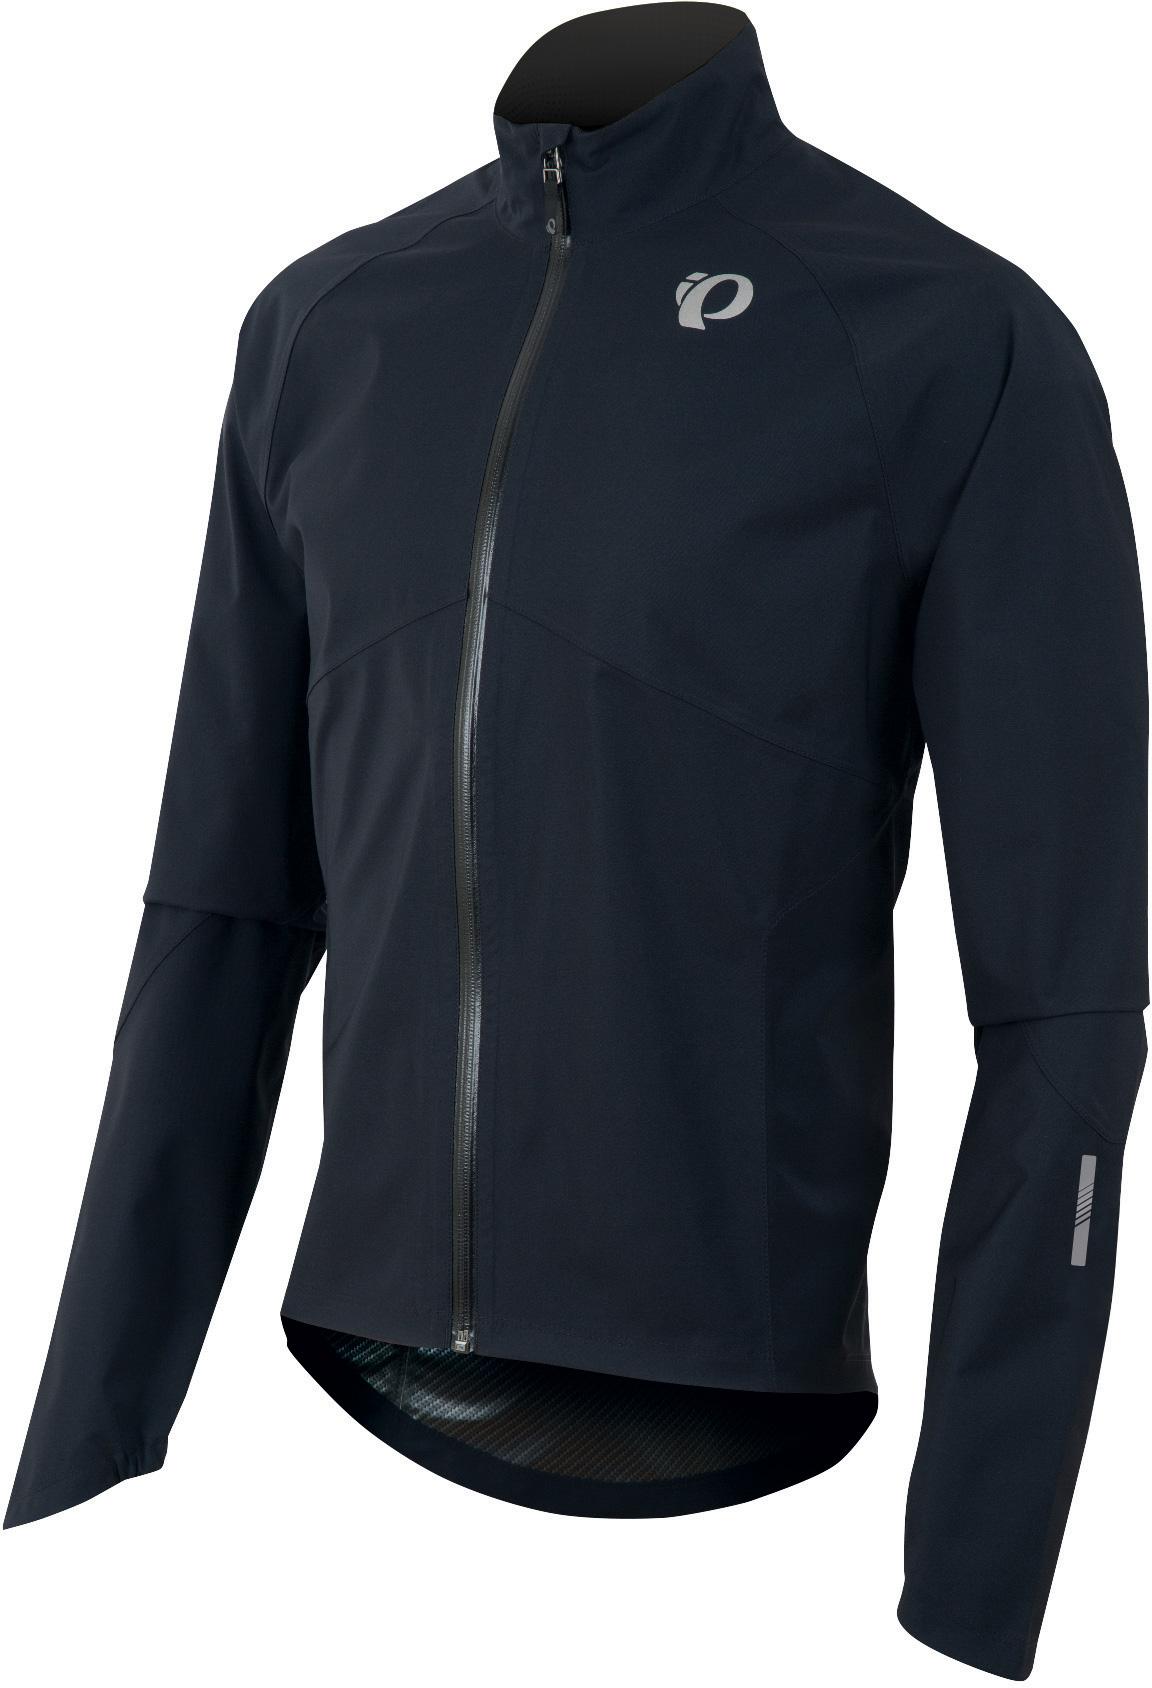 Large Black//Black Pearl iZUMi Select Barrier Wxb Jacket X-Large